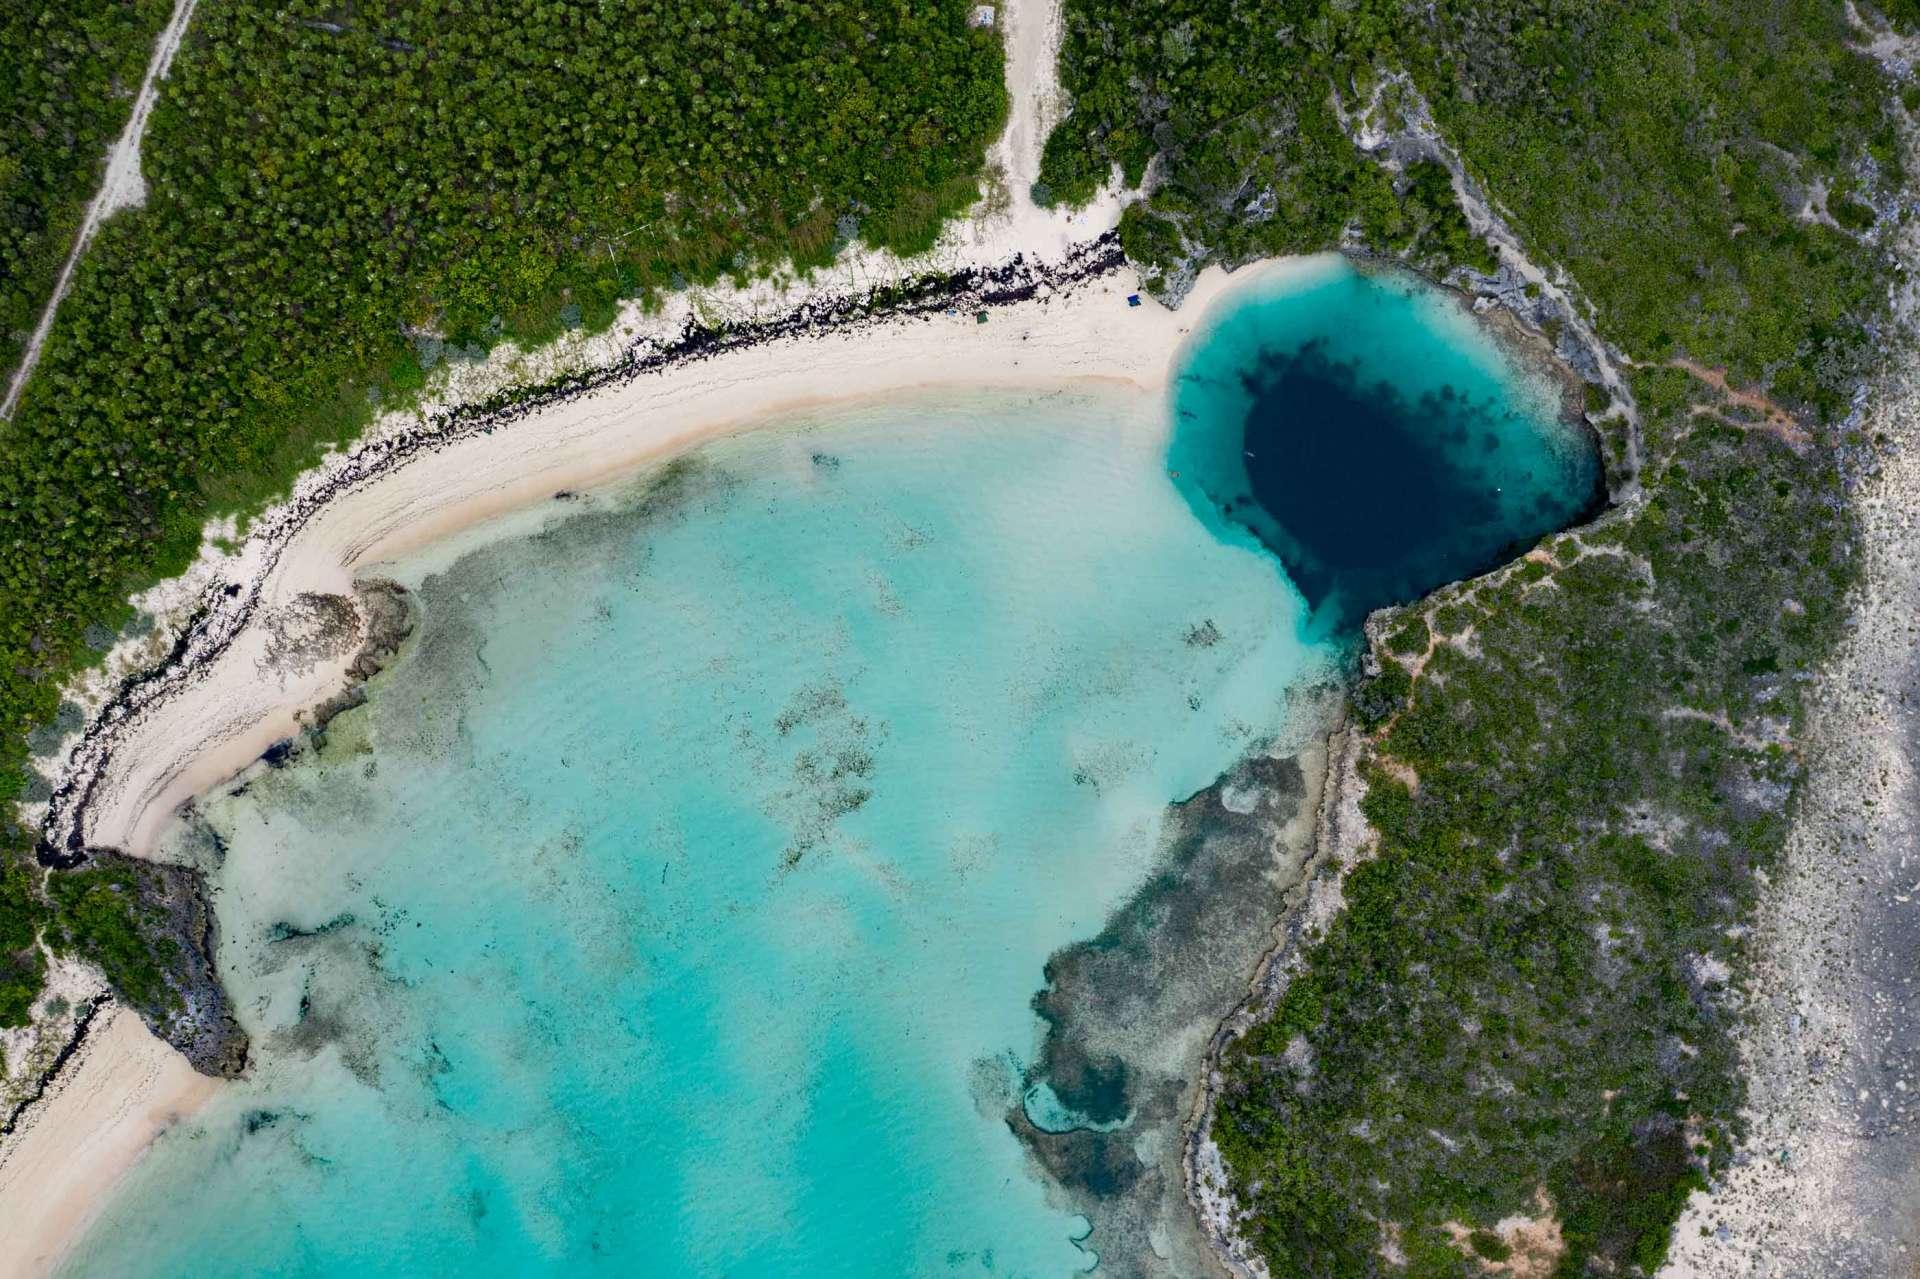 Bahamas Long Island Dean's Blue Hole aerial drone photography 2